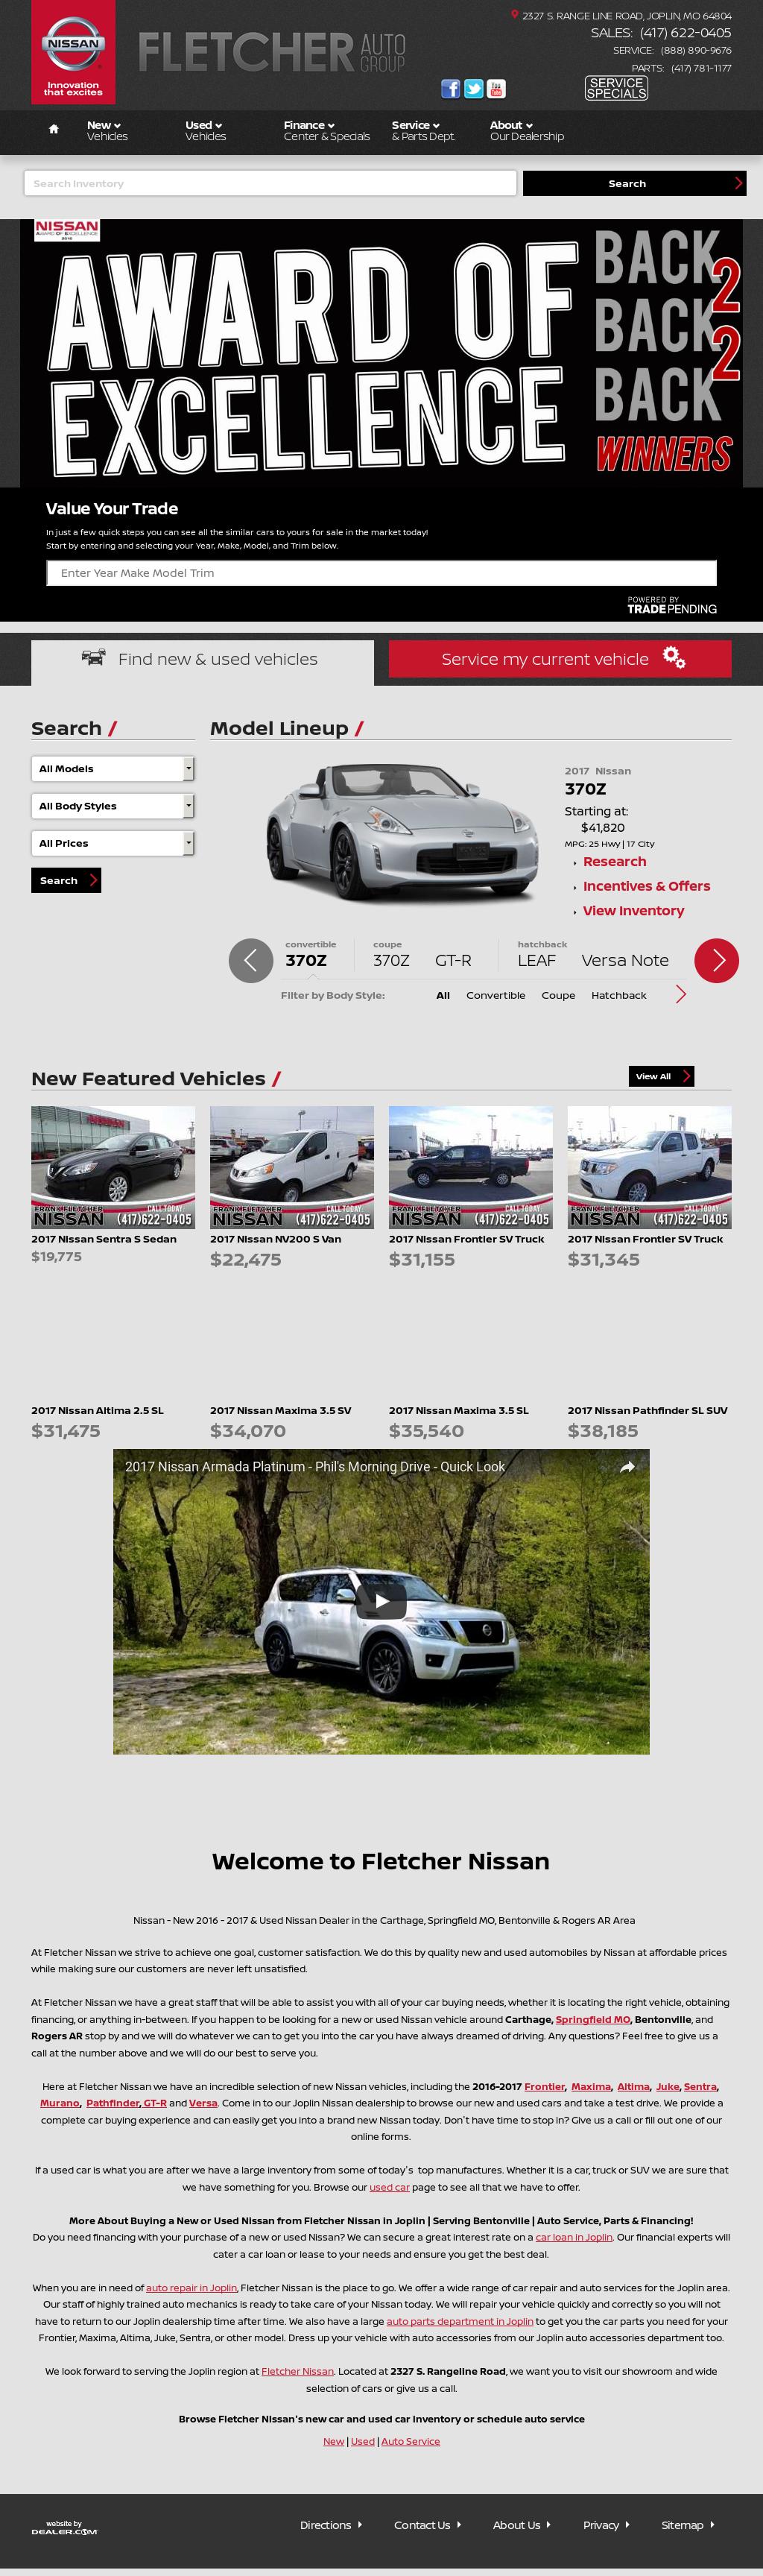 Frank Fletcher Nissan Website History